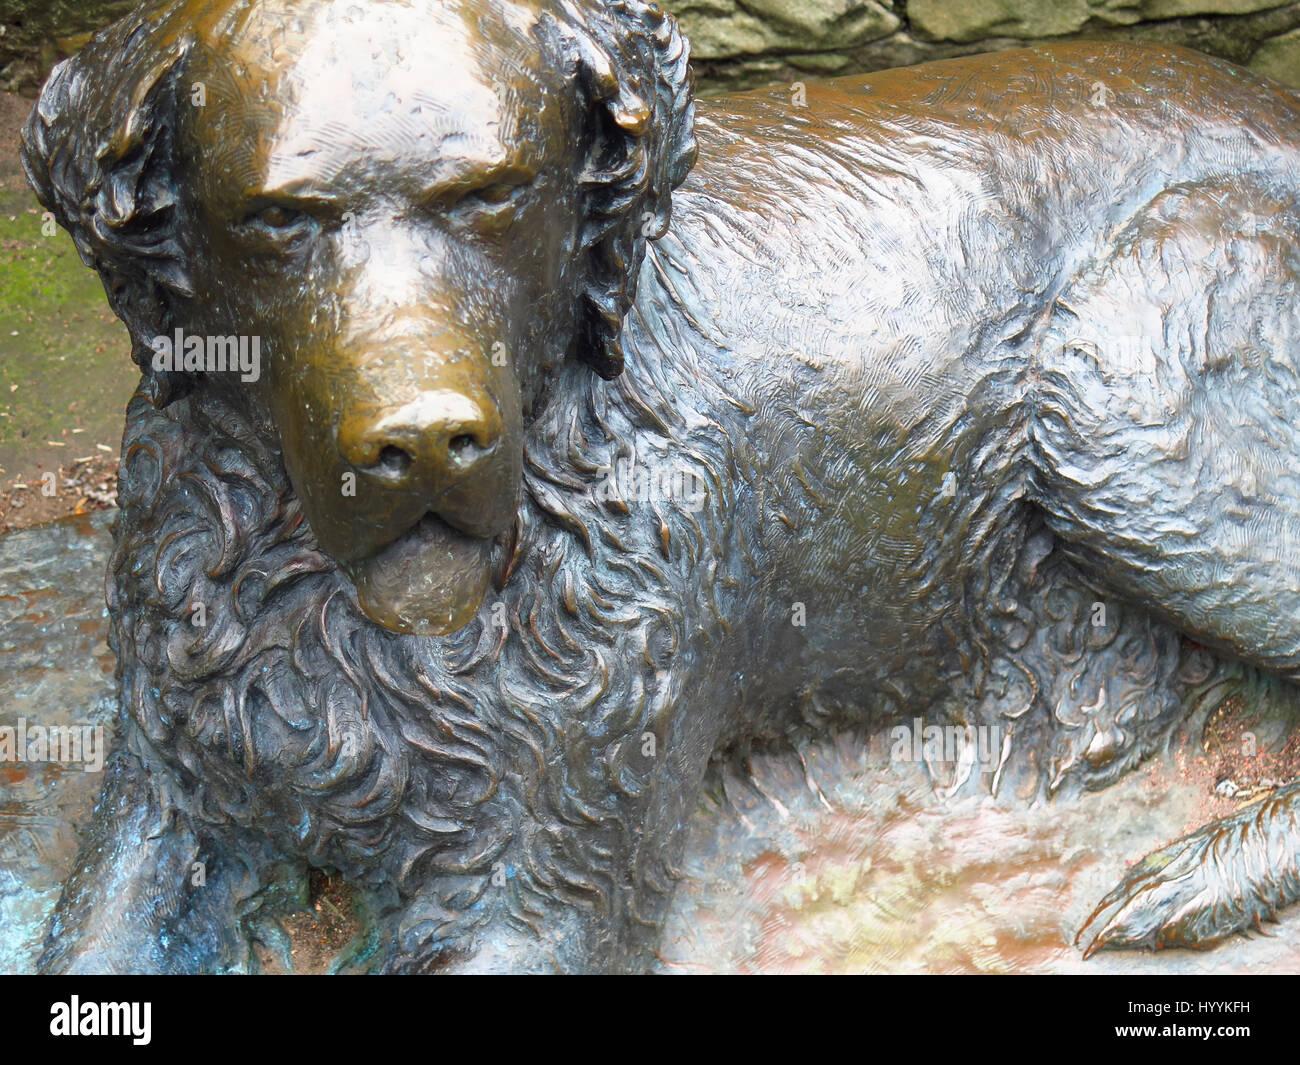 Model of the dog Bum the San Diego ragabond dog in Princes Street Gardens Edinburgh - Stock Image